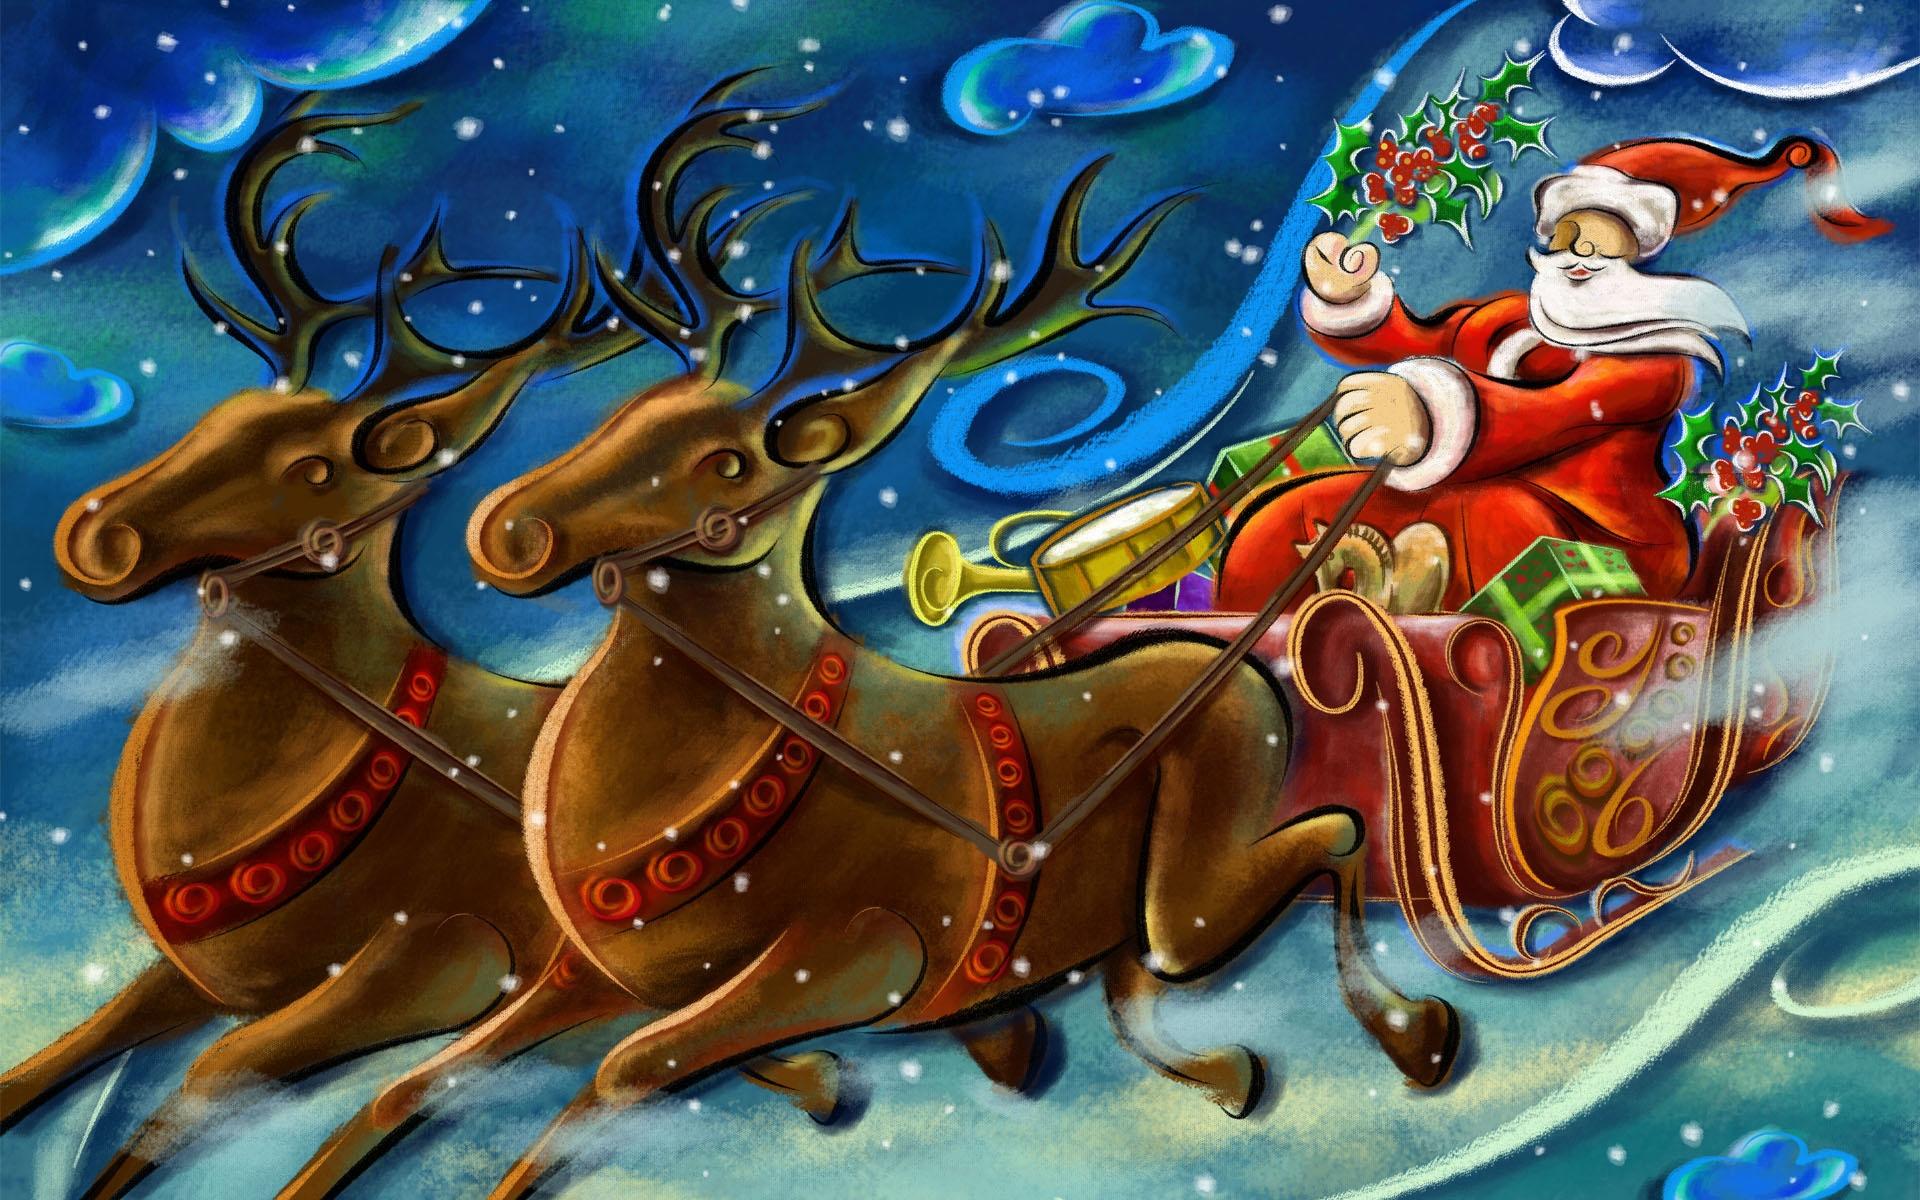 craft work wallpaper free download: Santa Clause Creative Art Work Wallpapers In Jpg Format